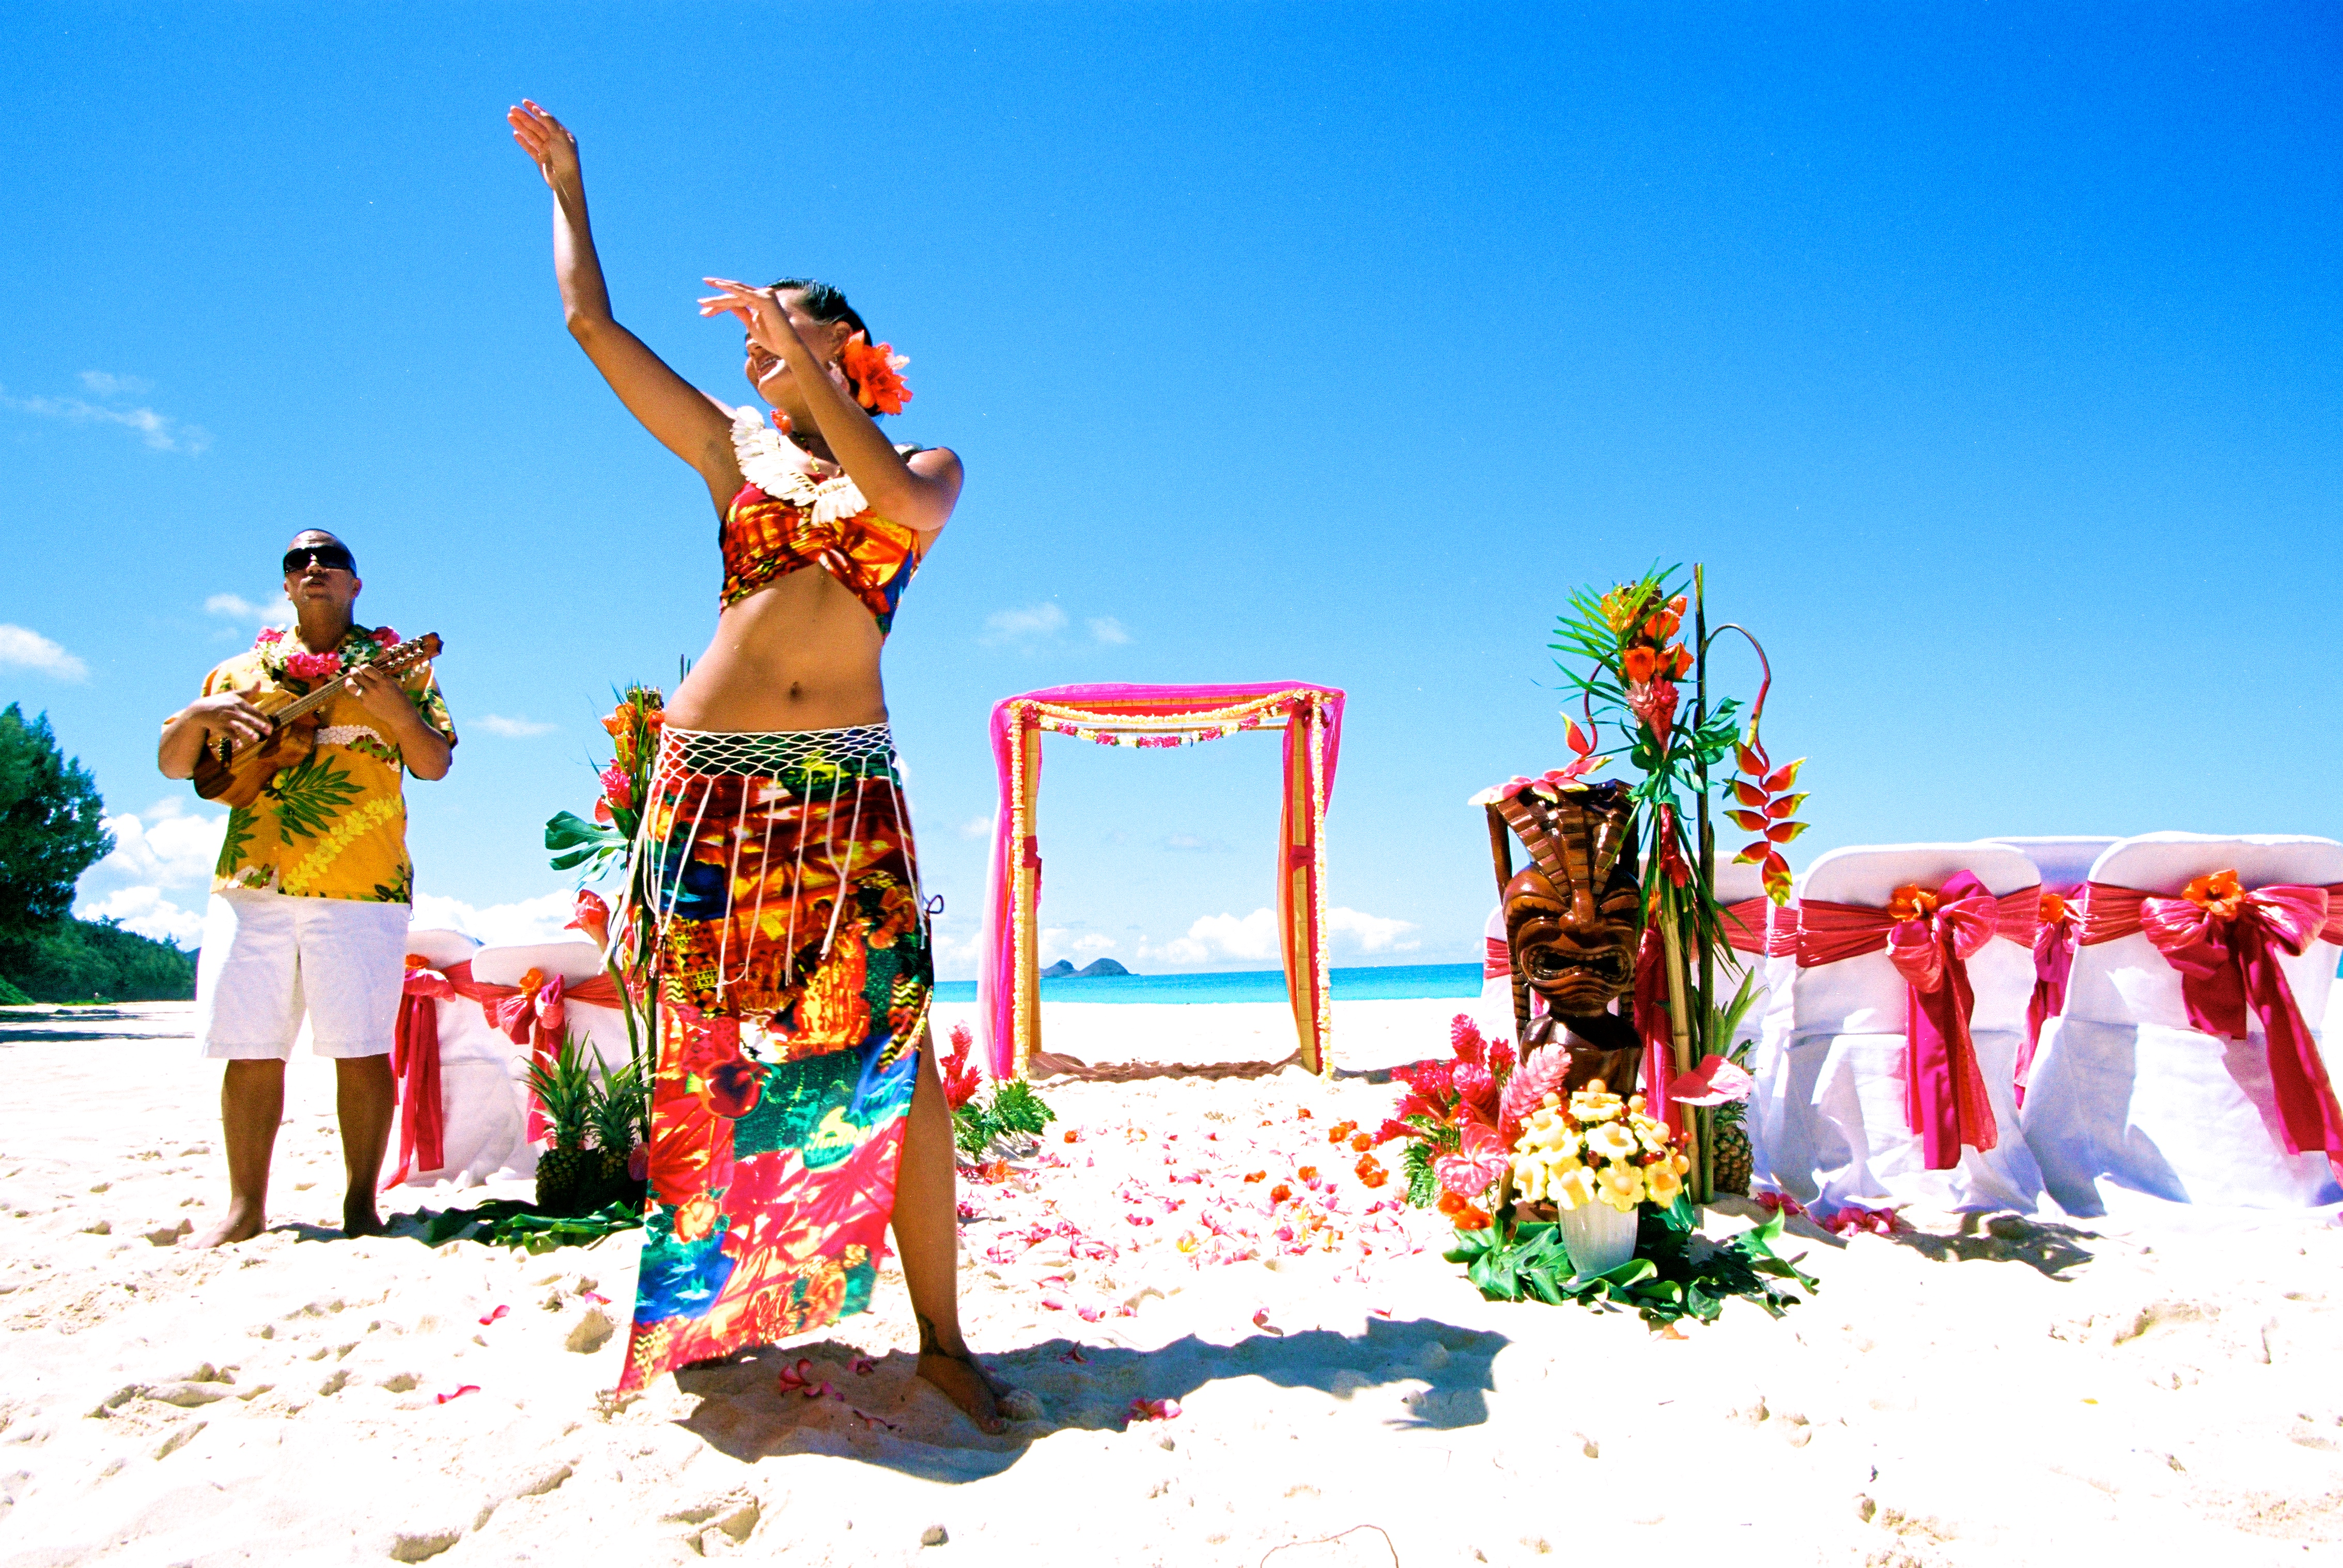 Hawaiian hula dancer with Ukulele 4